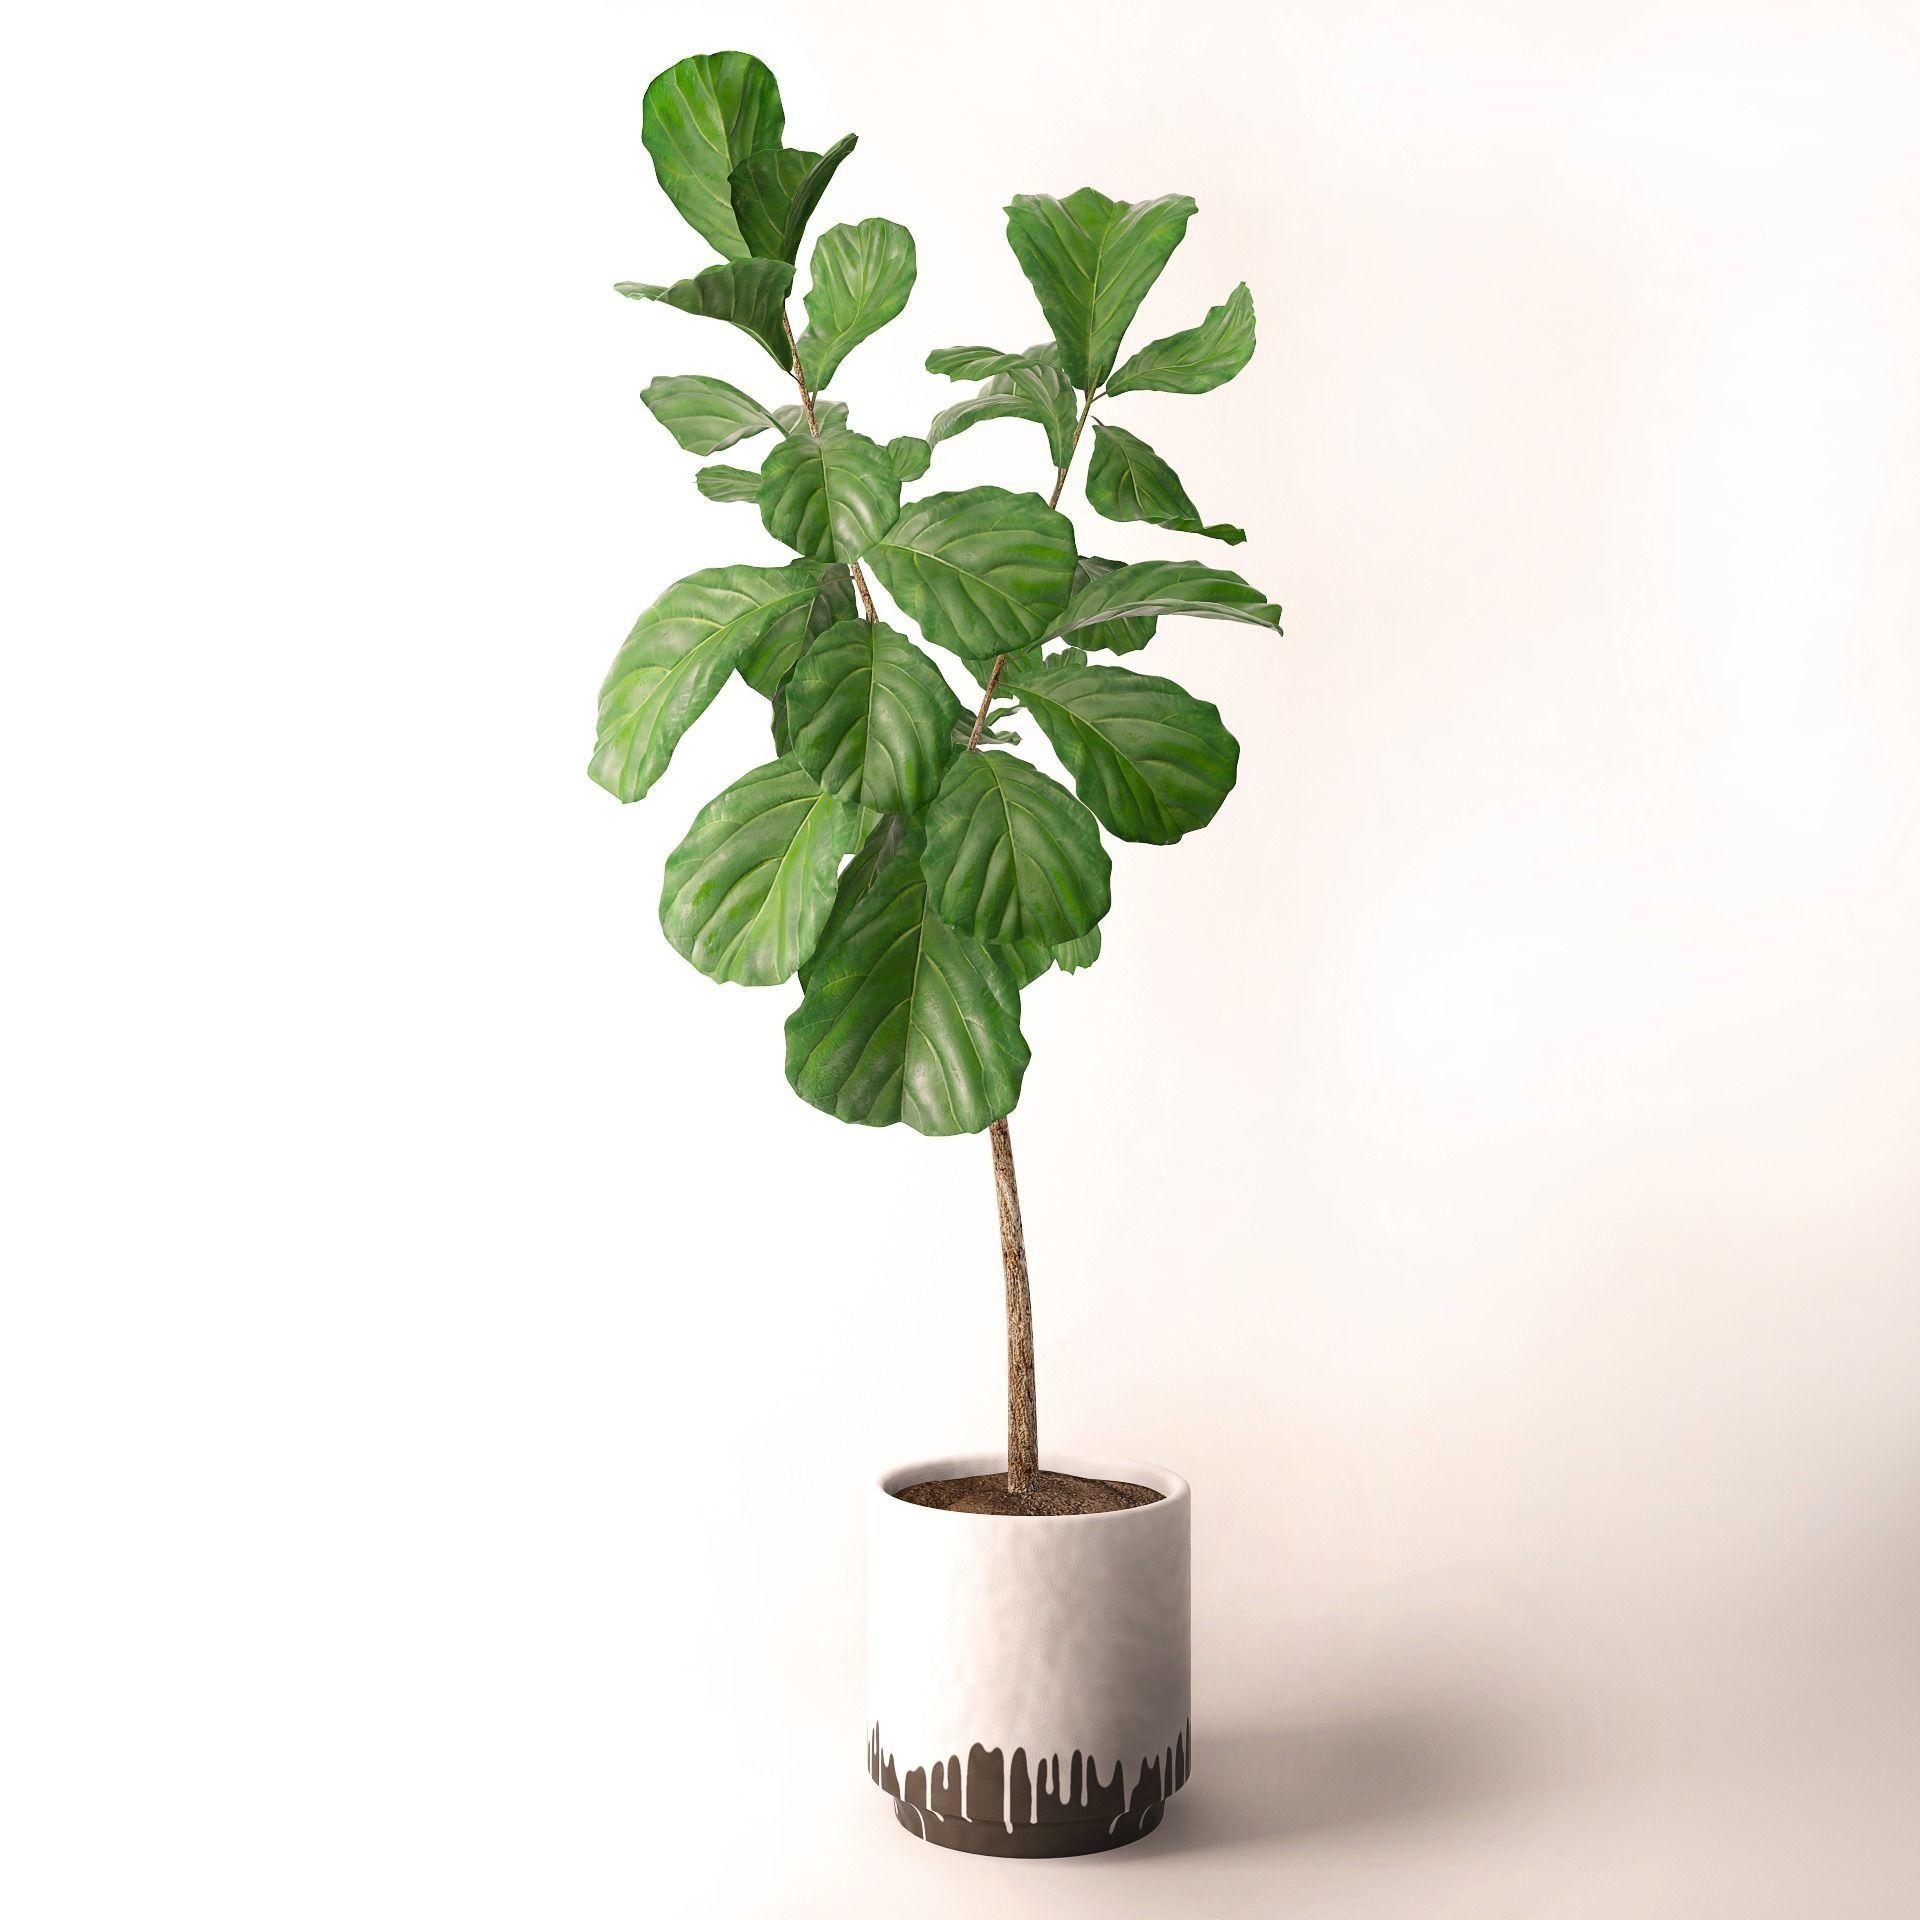 Planta ficus en maceta blanca